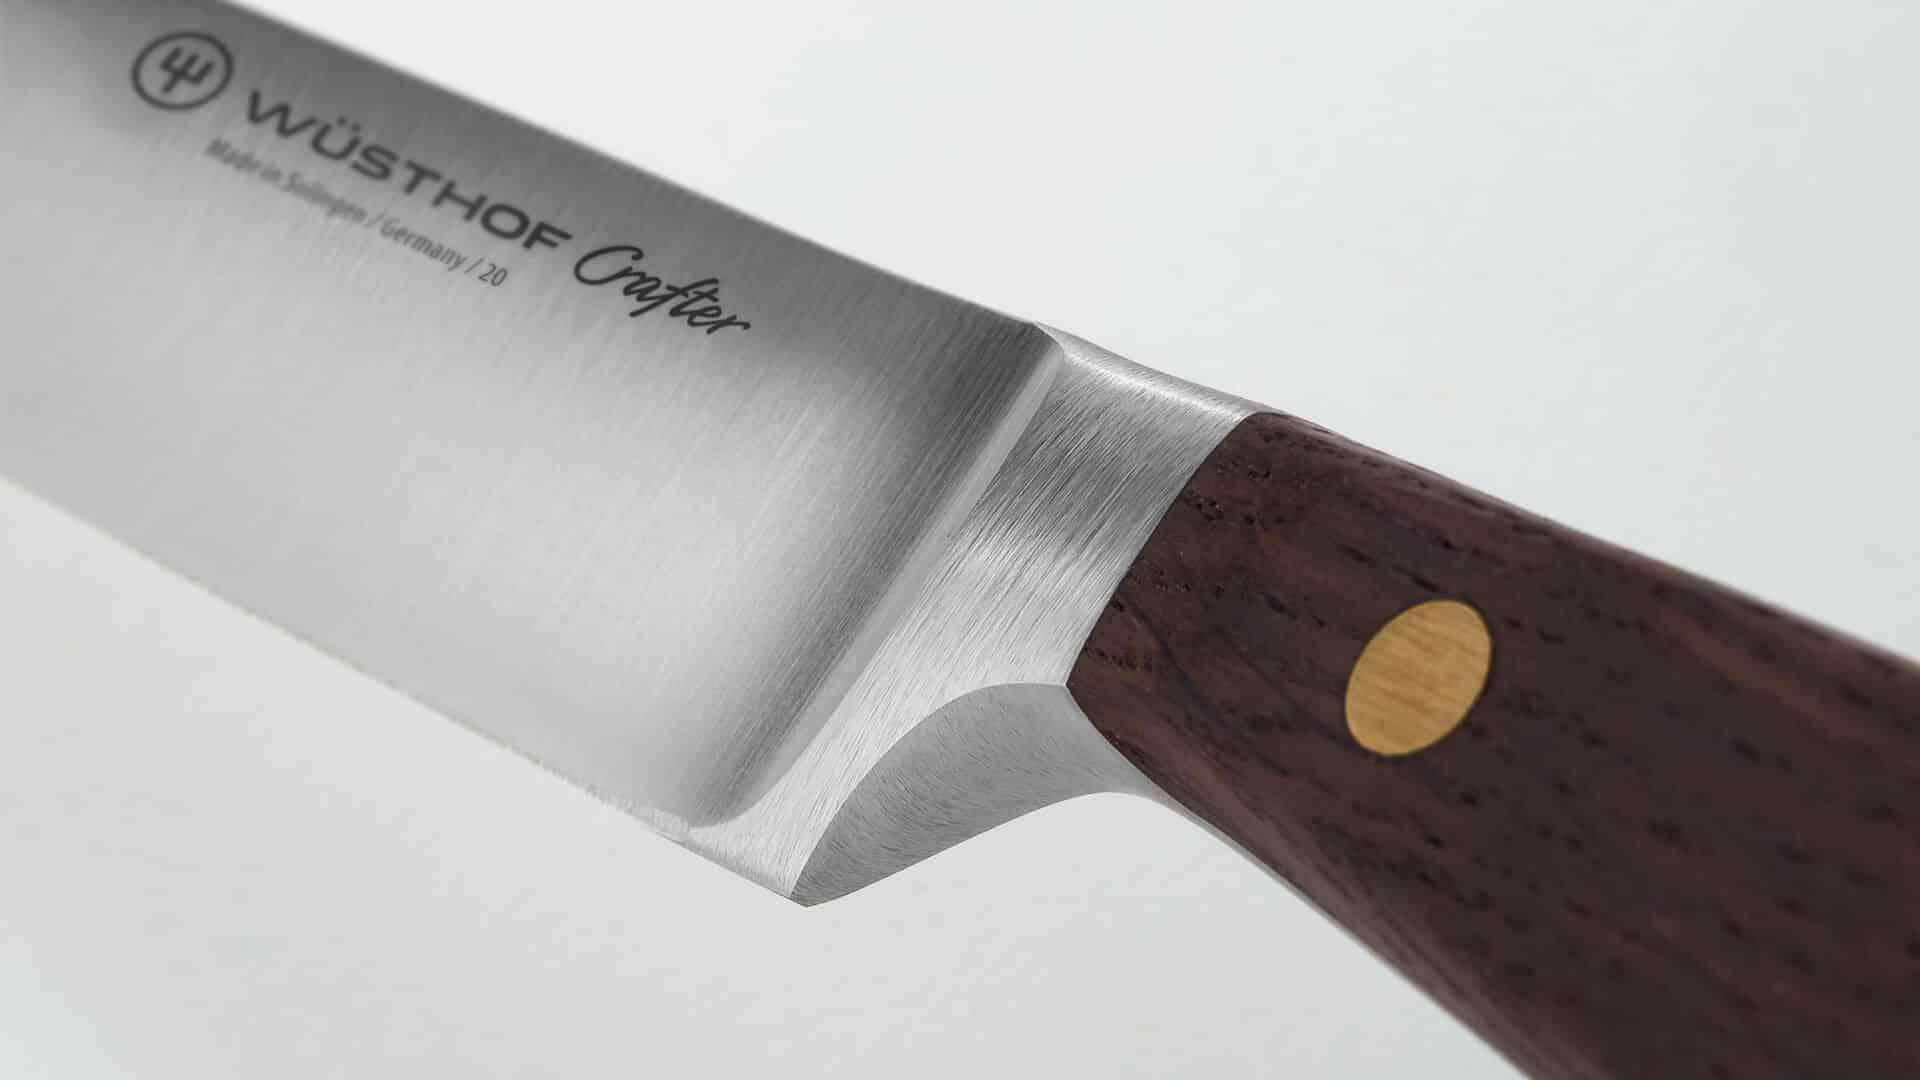 wuesthof-crafter-gemuesemesser-solingen-messer-kaufen-vollkropf